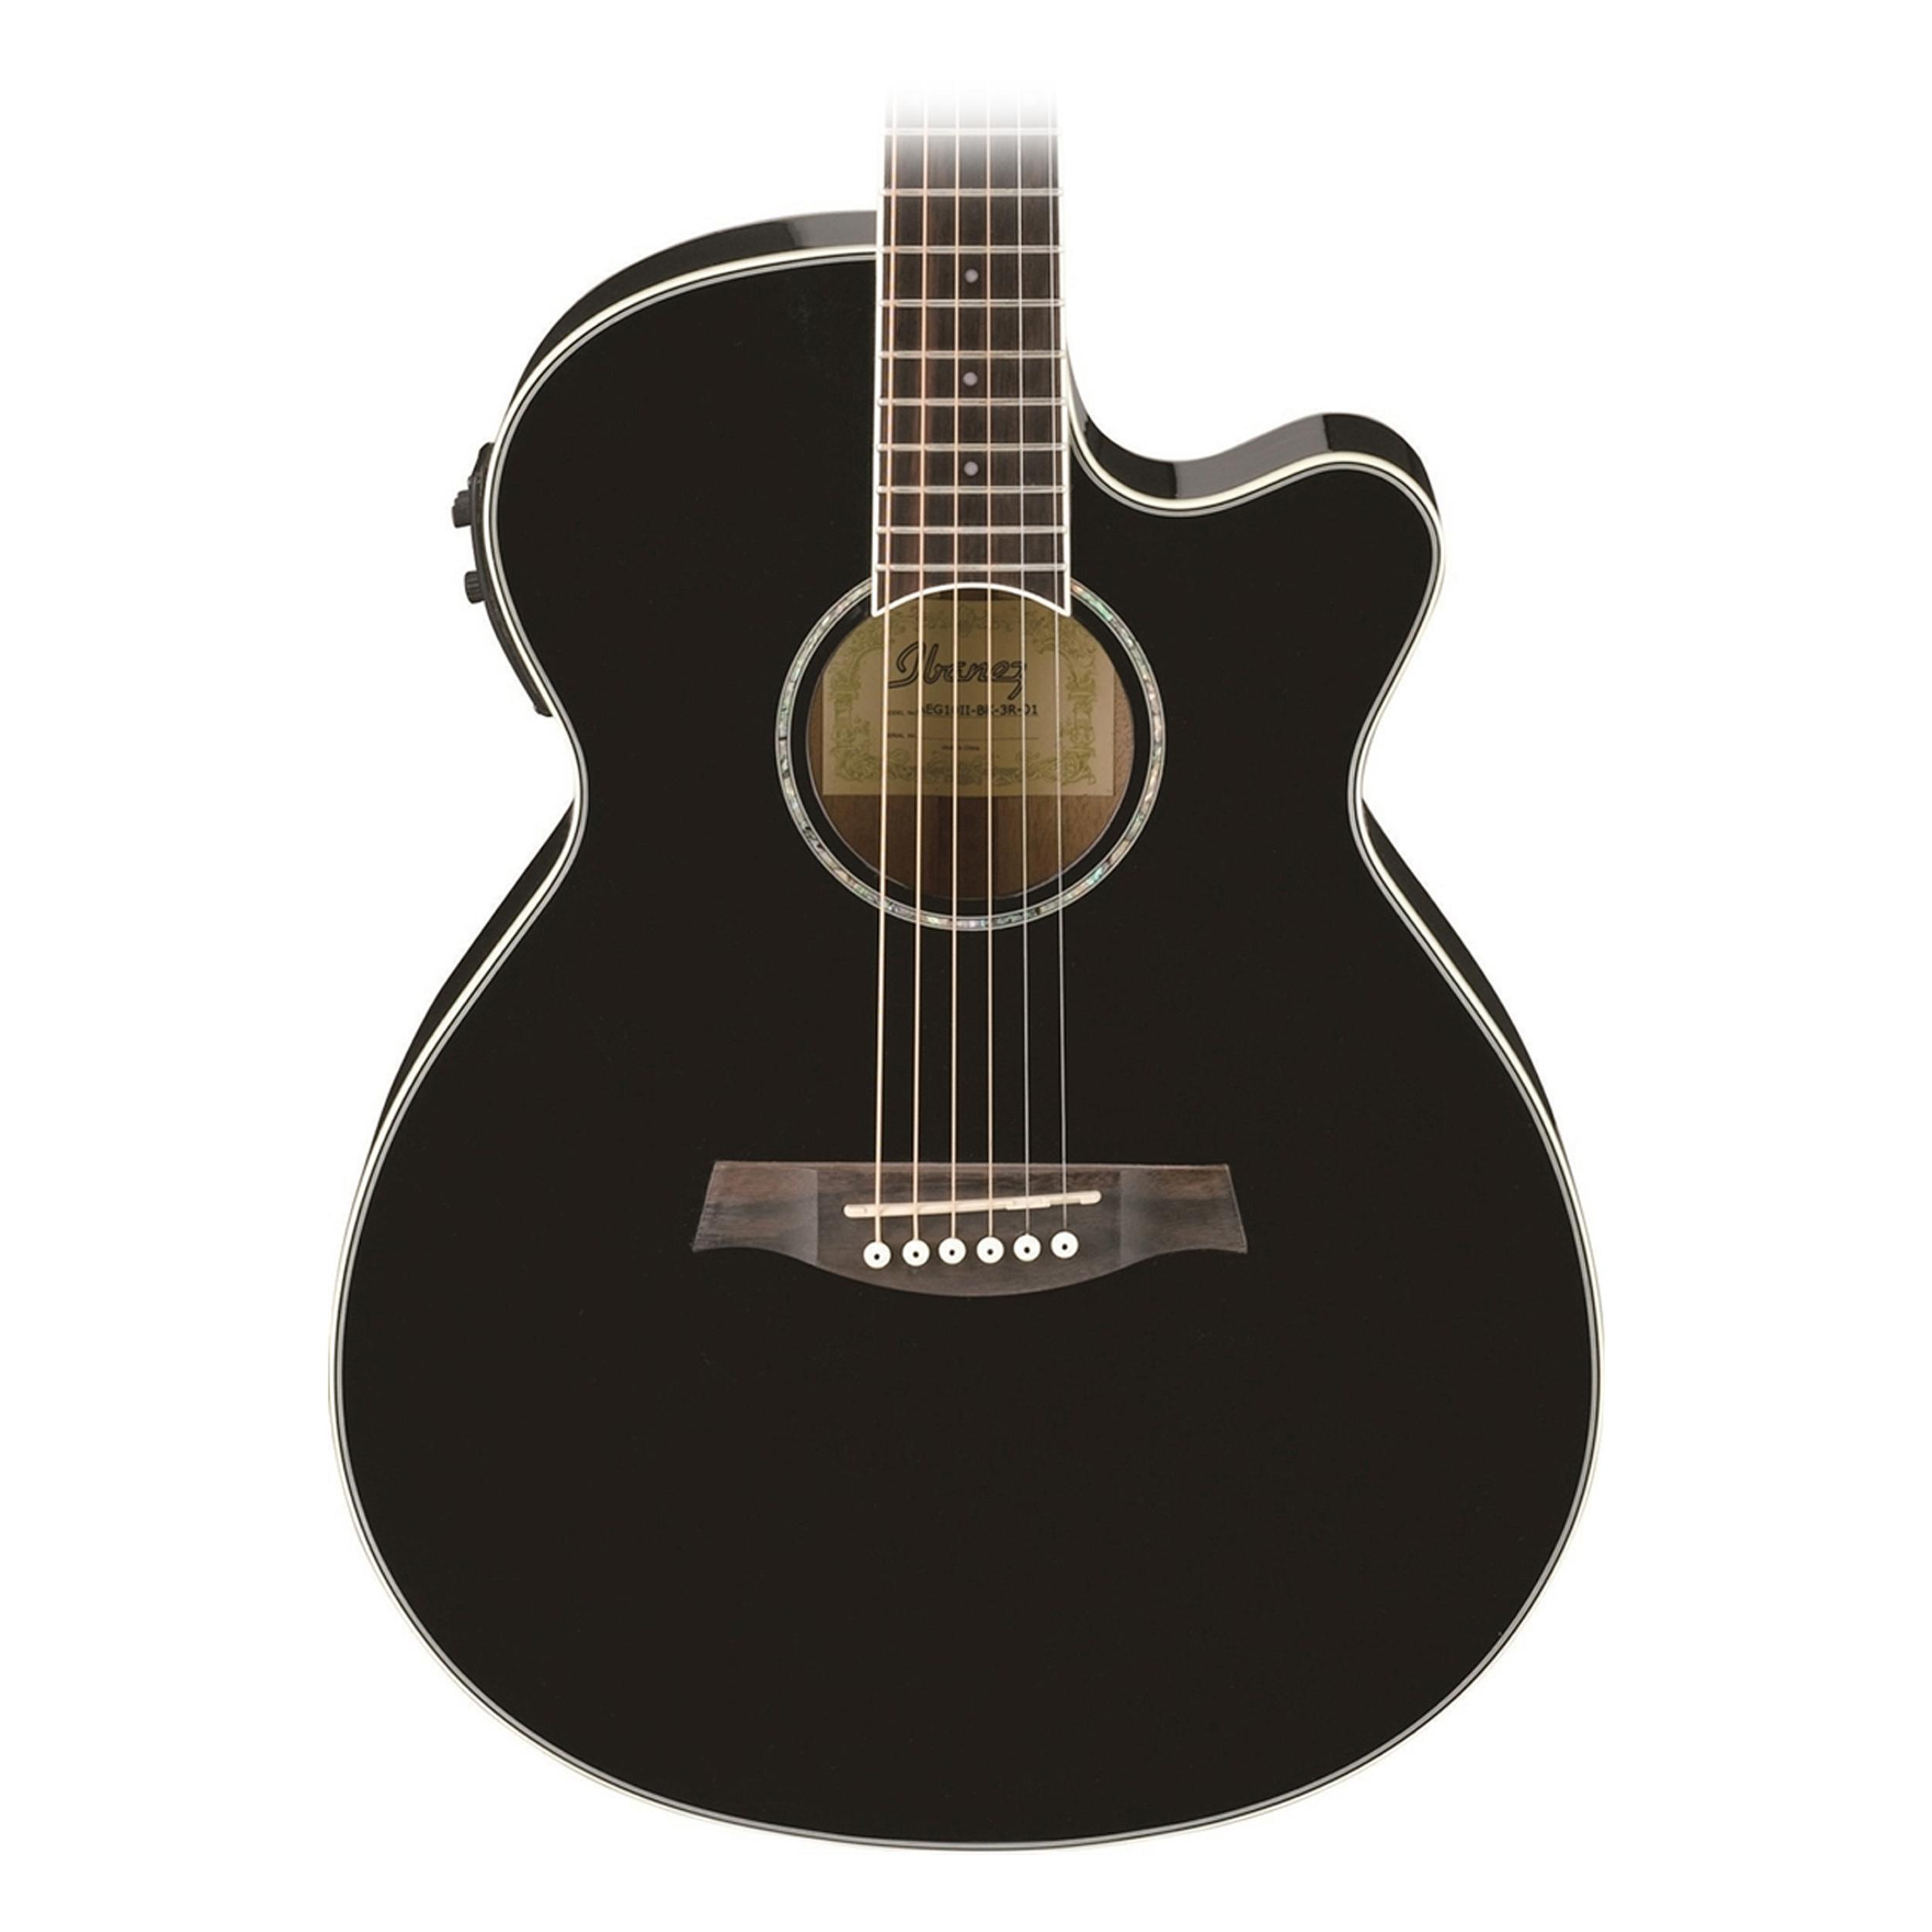 ibanez aeg10iibk black acoustic electric guitar. Black Bedroom Furniture Sets. Home Design Ideas